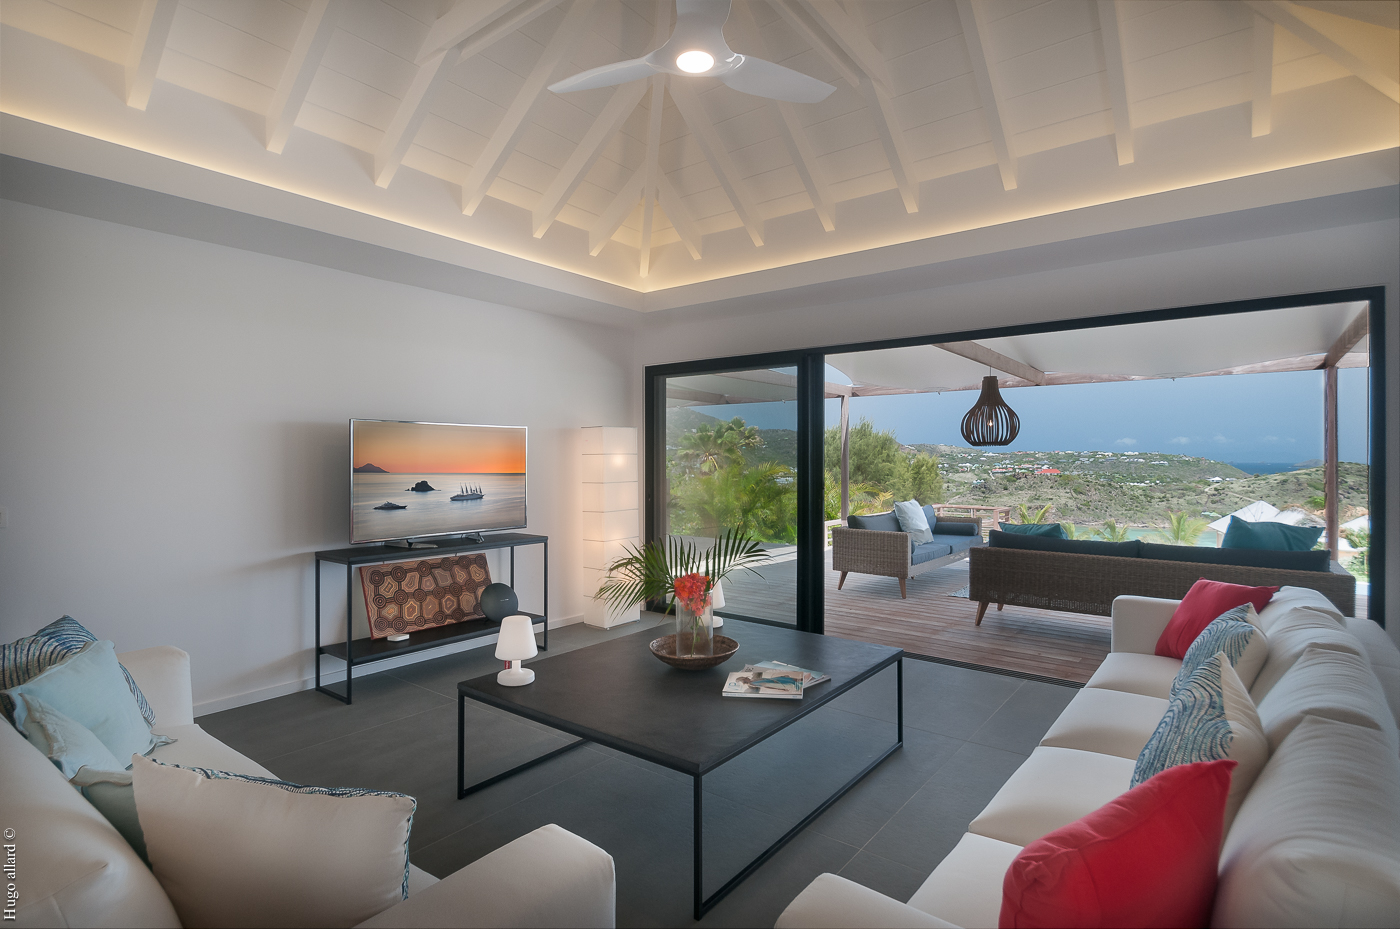 Villa Cairn - Hillside Villa For Rent St Barth Petit Cul de Sac with Spacious Living Areas - Living room